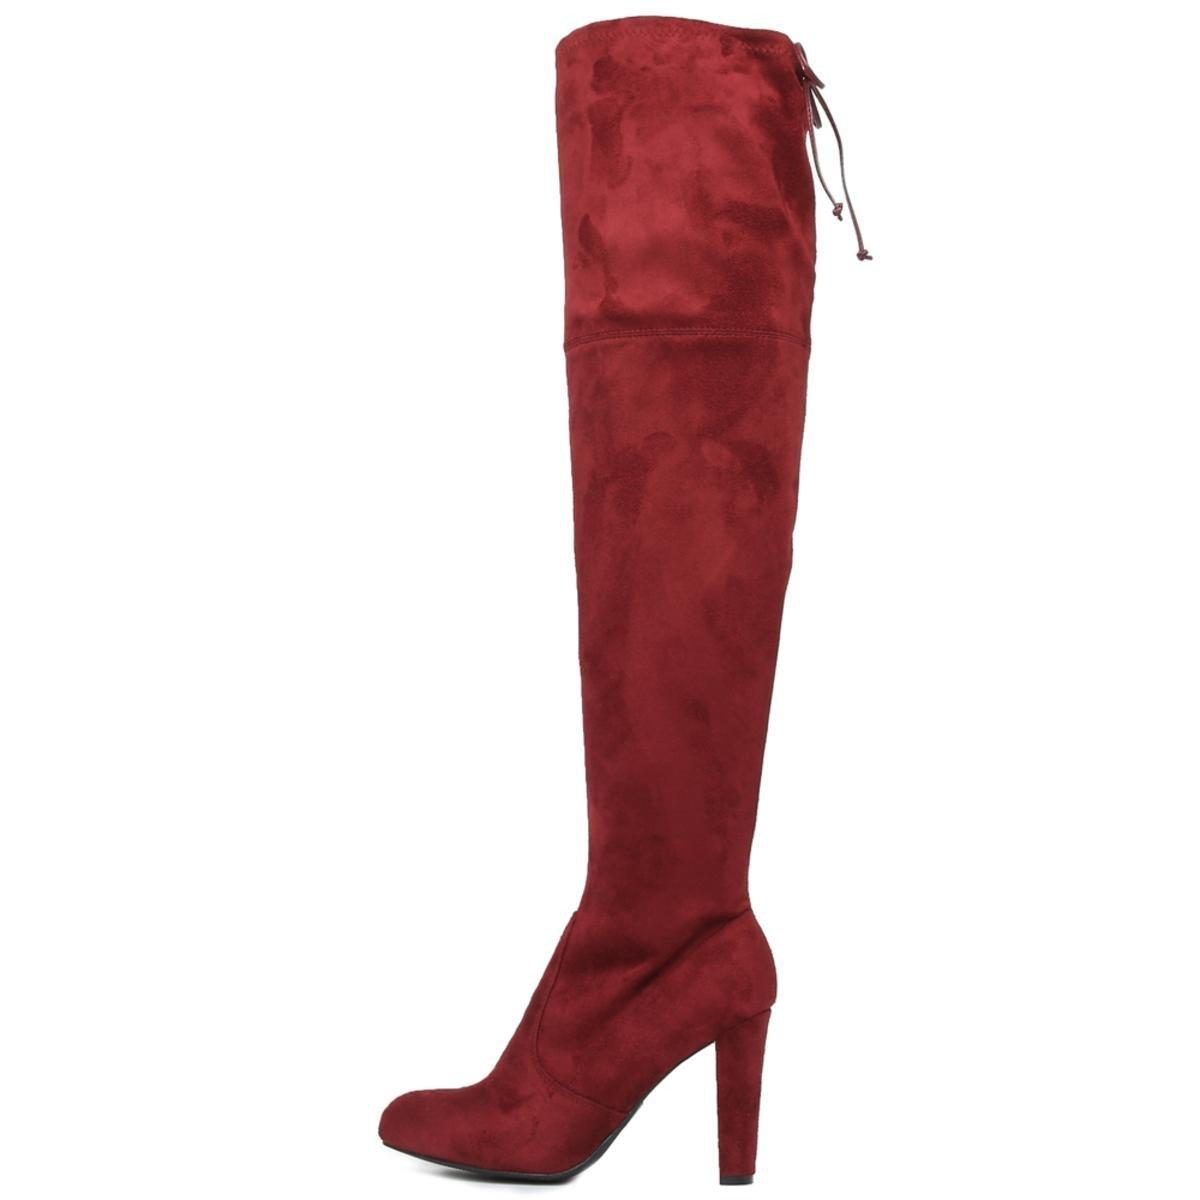 eea2ab0f3b61 Lyst - Wild Diva Amaya-01 High Heel Boot in Red